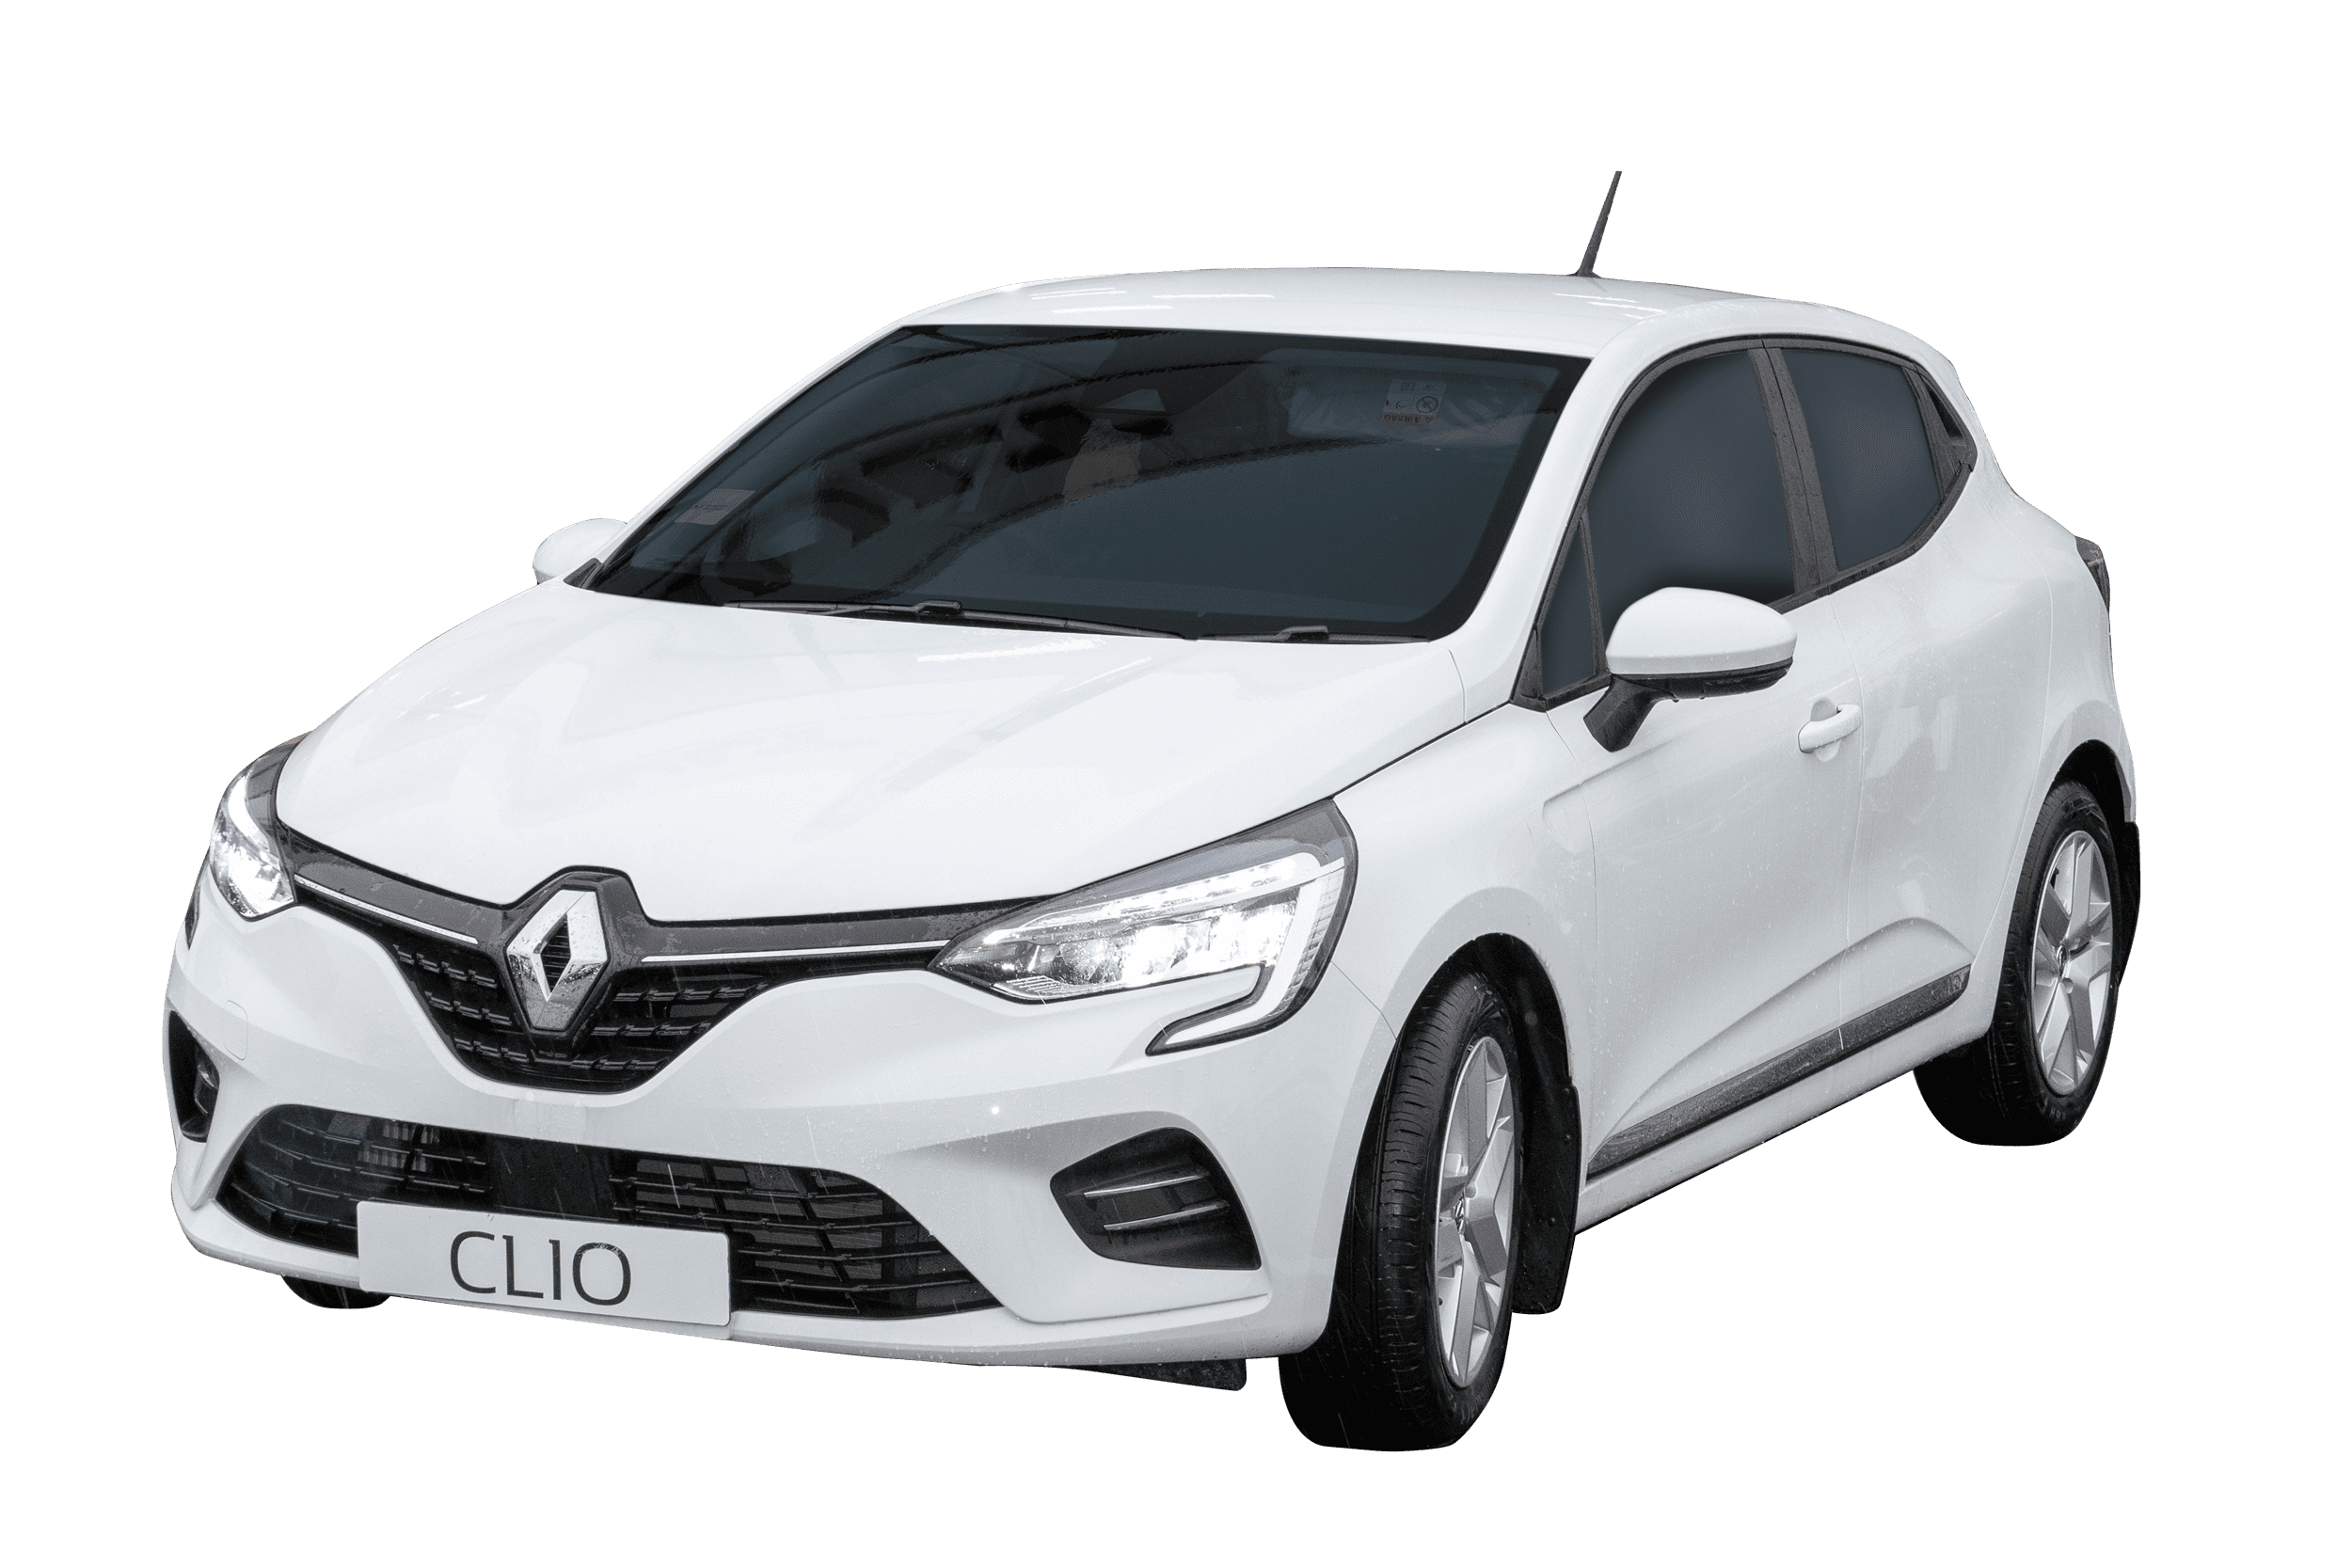 Image of Renault Clio